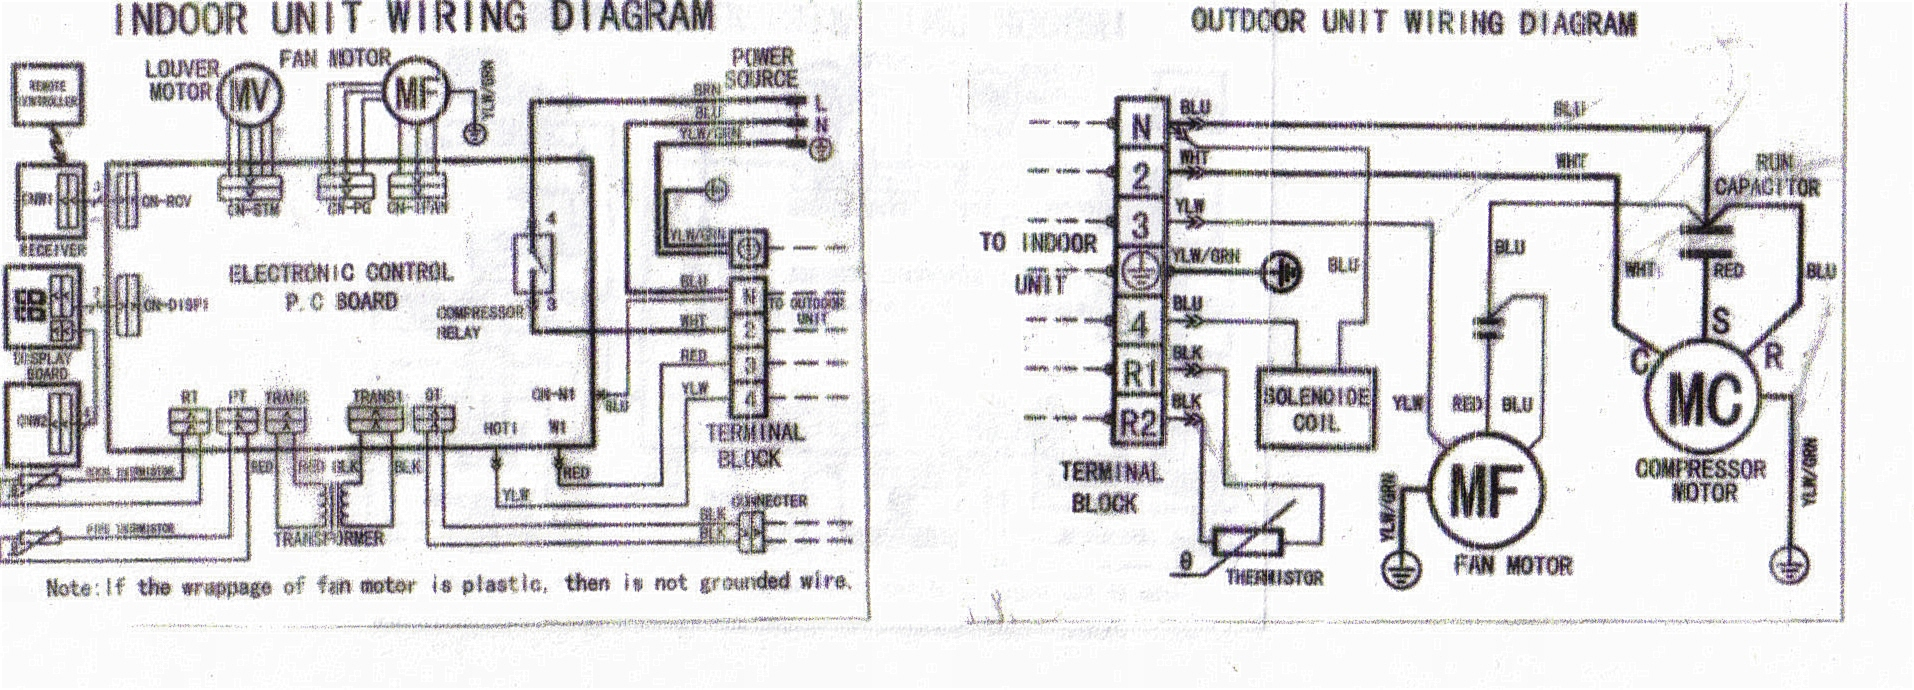 Solucionado Diagrama electrico de targeta de split